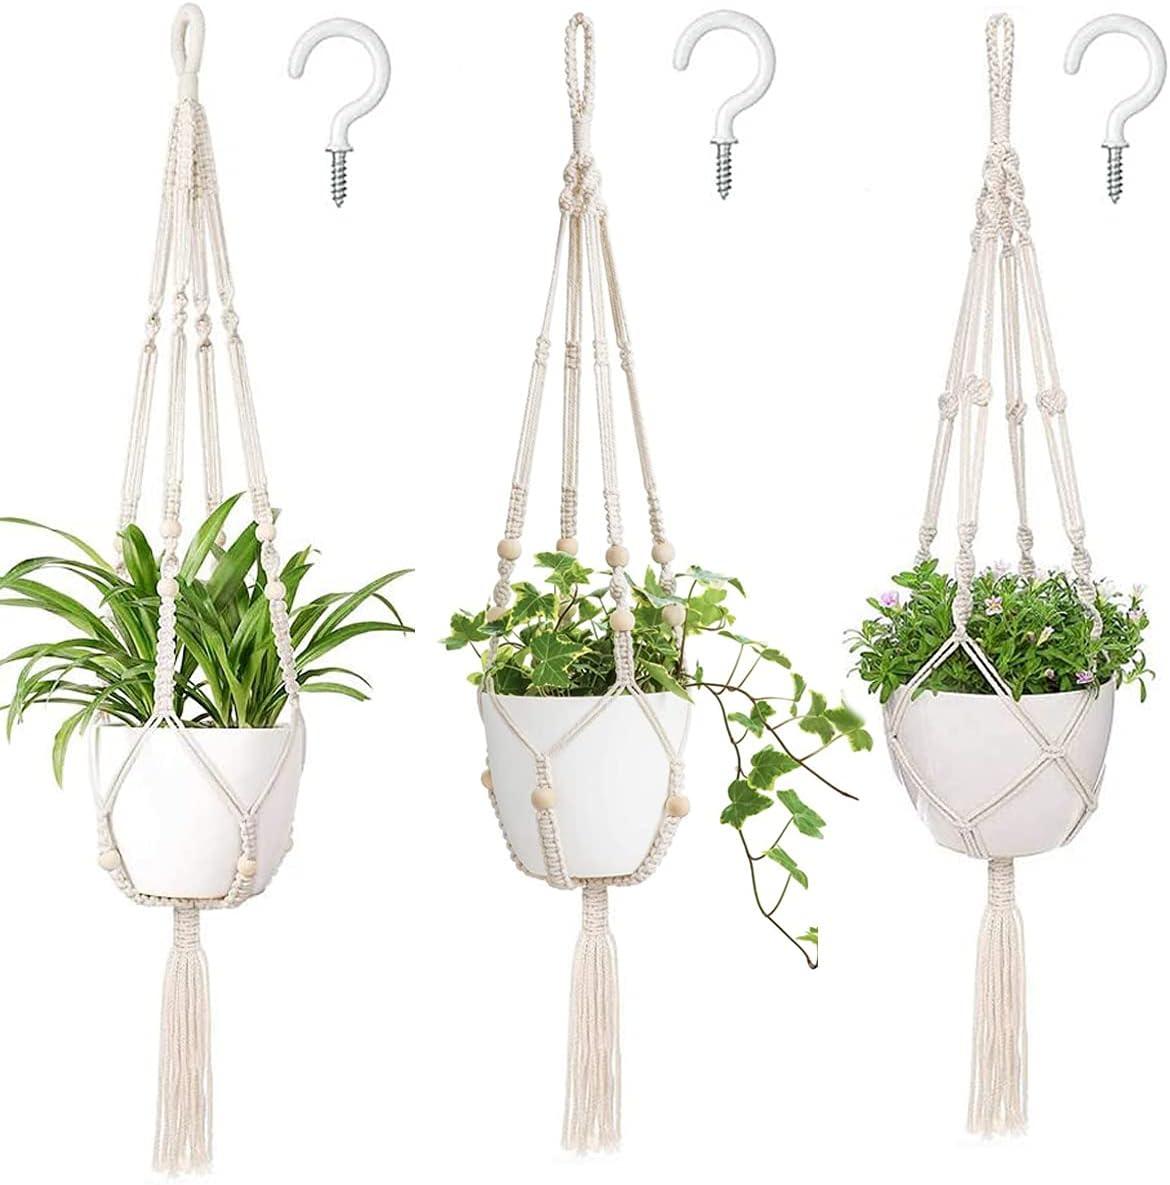 Macrame Plant Hangers 3 Pack Indoor Hanging Nippon regular agency Meta Planters OFFicial shop with